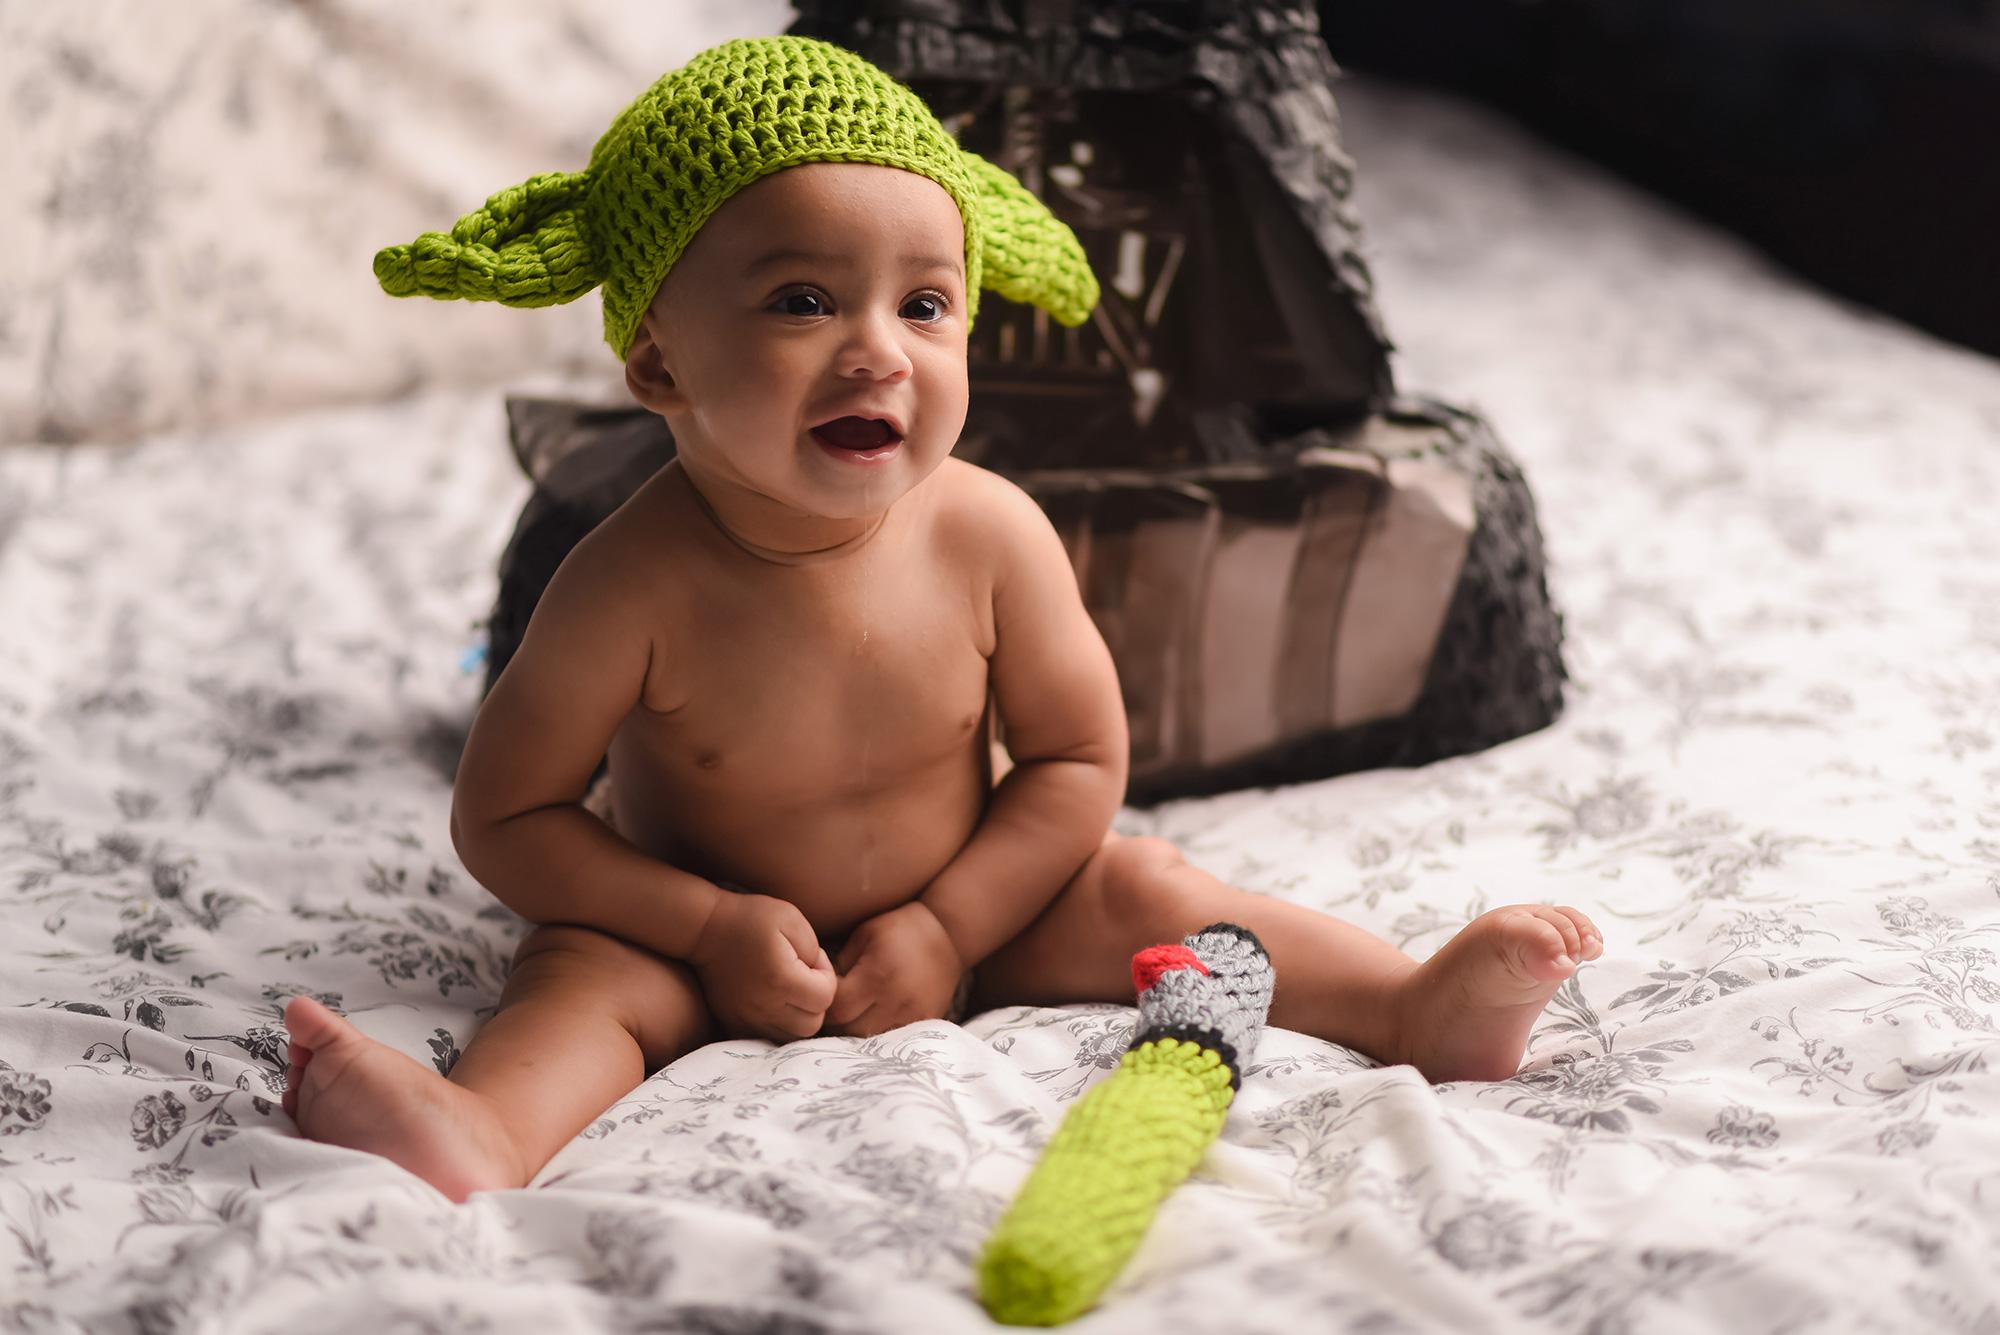 https://bworthyphotography.smugmug.com/BW-Website-Family-Session/Star-Wars-Luke